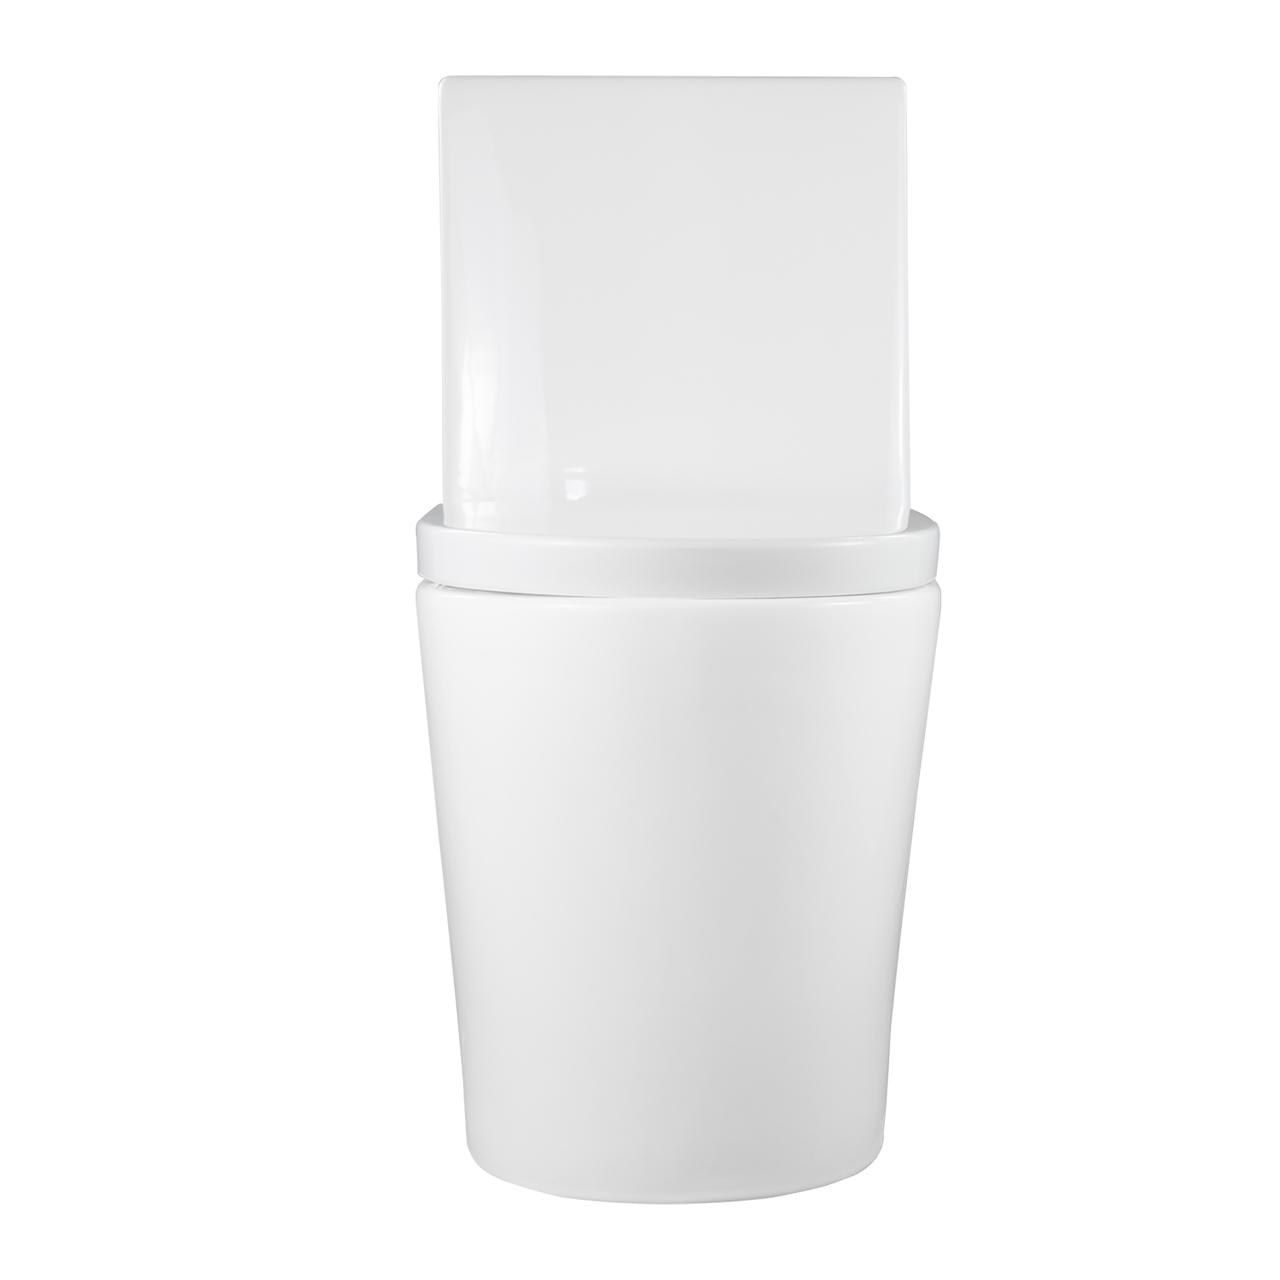 Vaso Sanitário Caixa Acoplada Redondo Branco Fluir